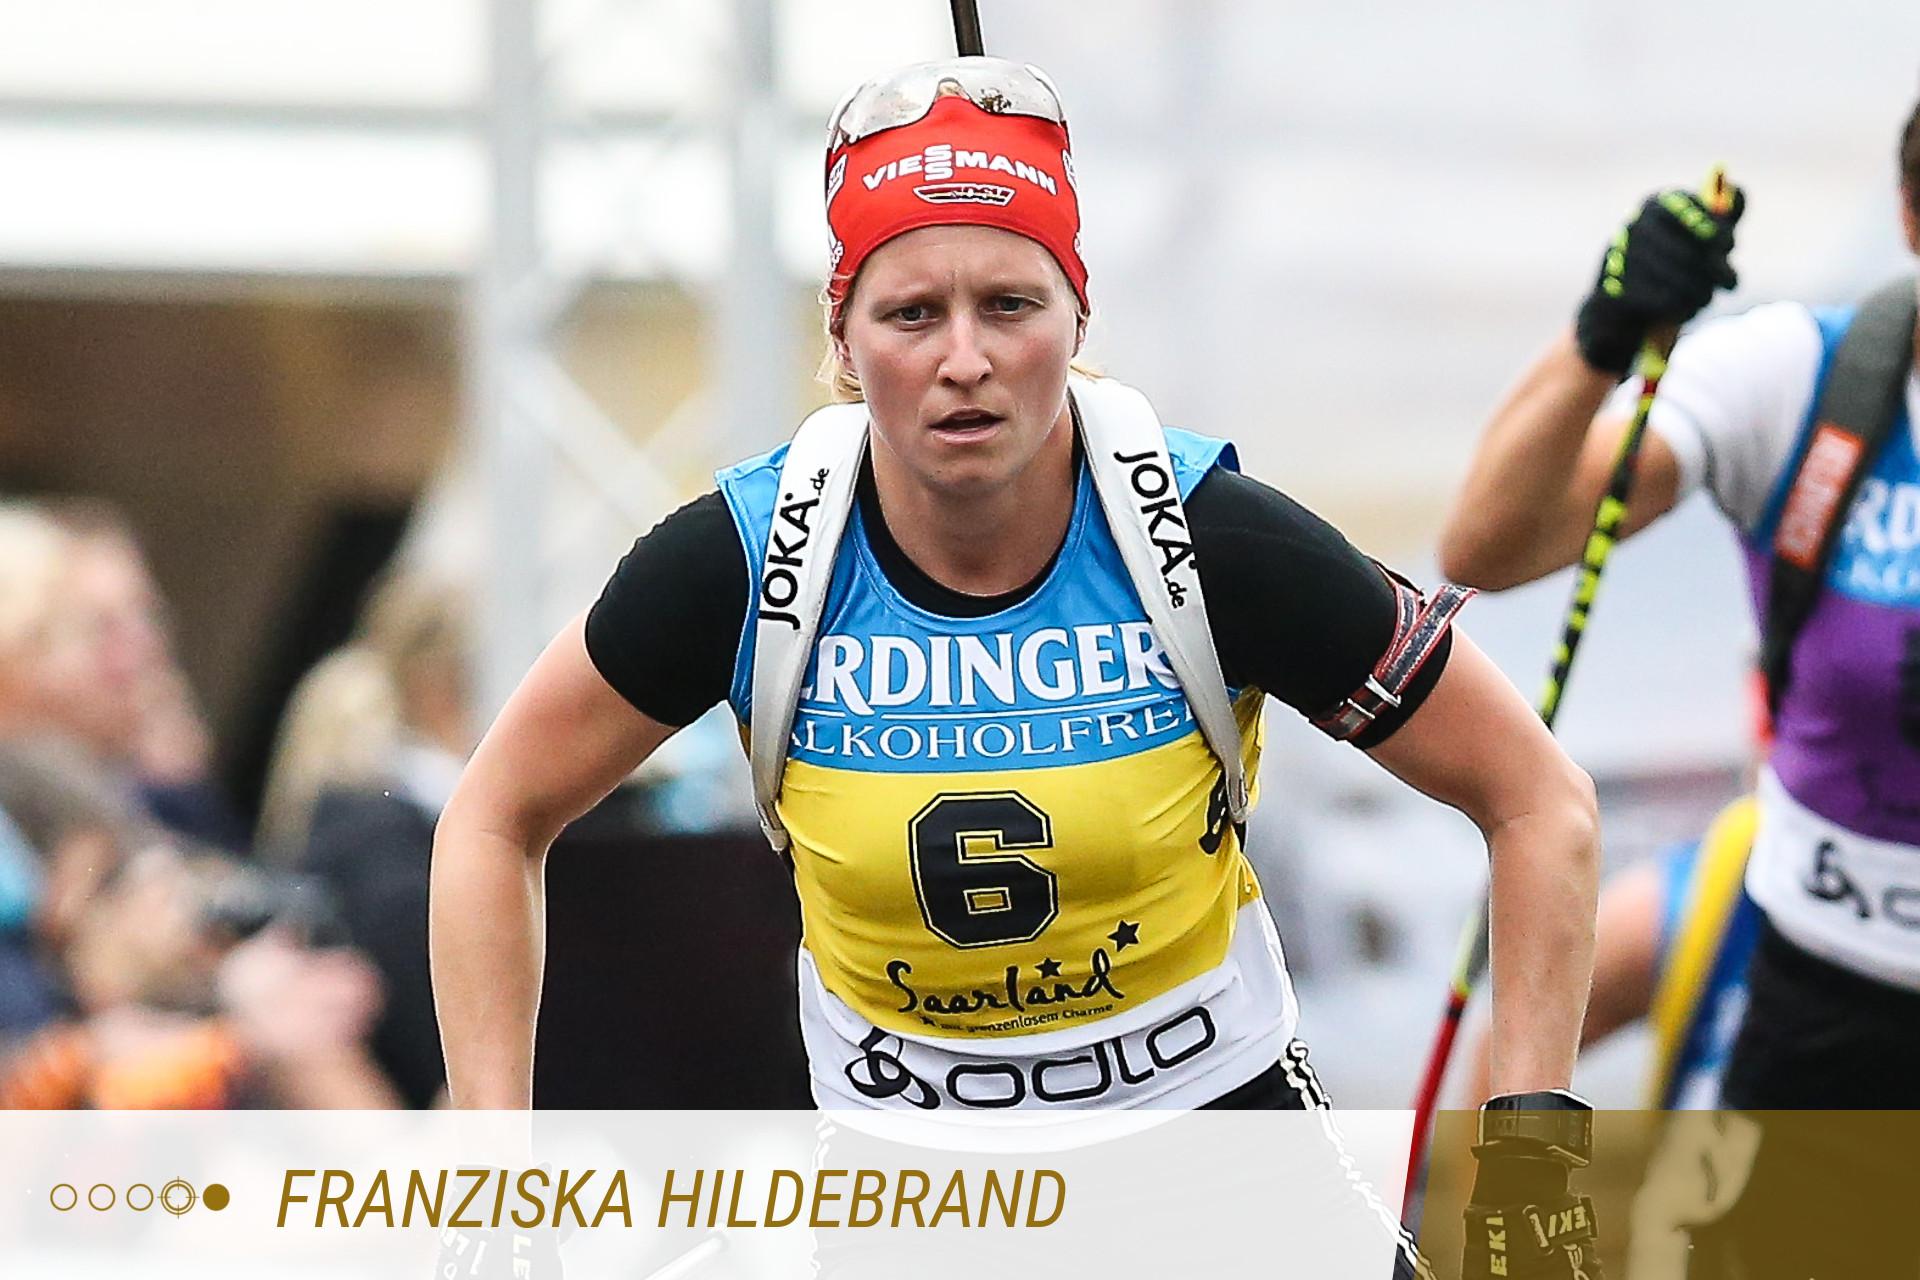 Athleten_FranziskaHildebrand